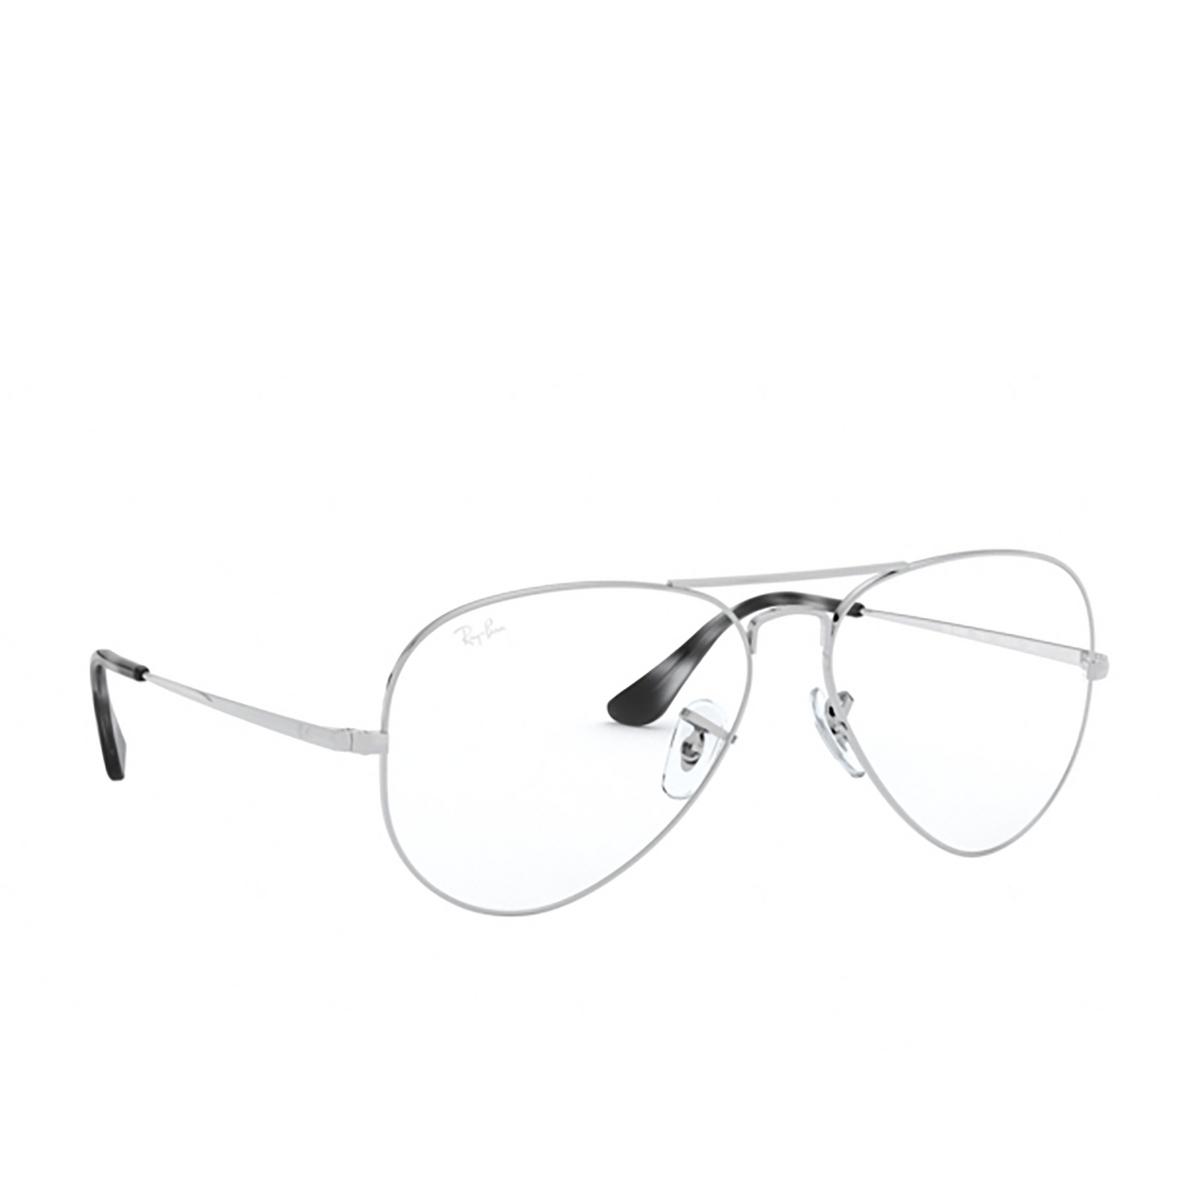 Ray-Ban® Aviator Eyeglasses: Aviator RX6489 color Silver 2501.